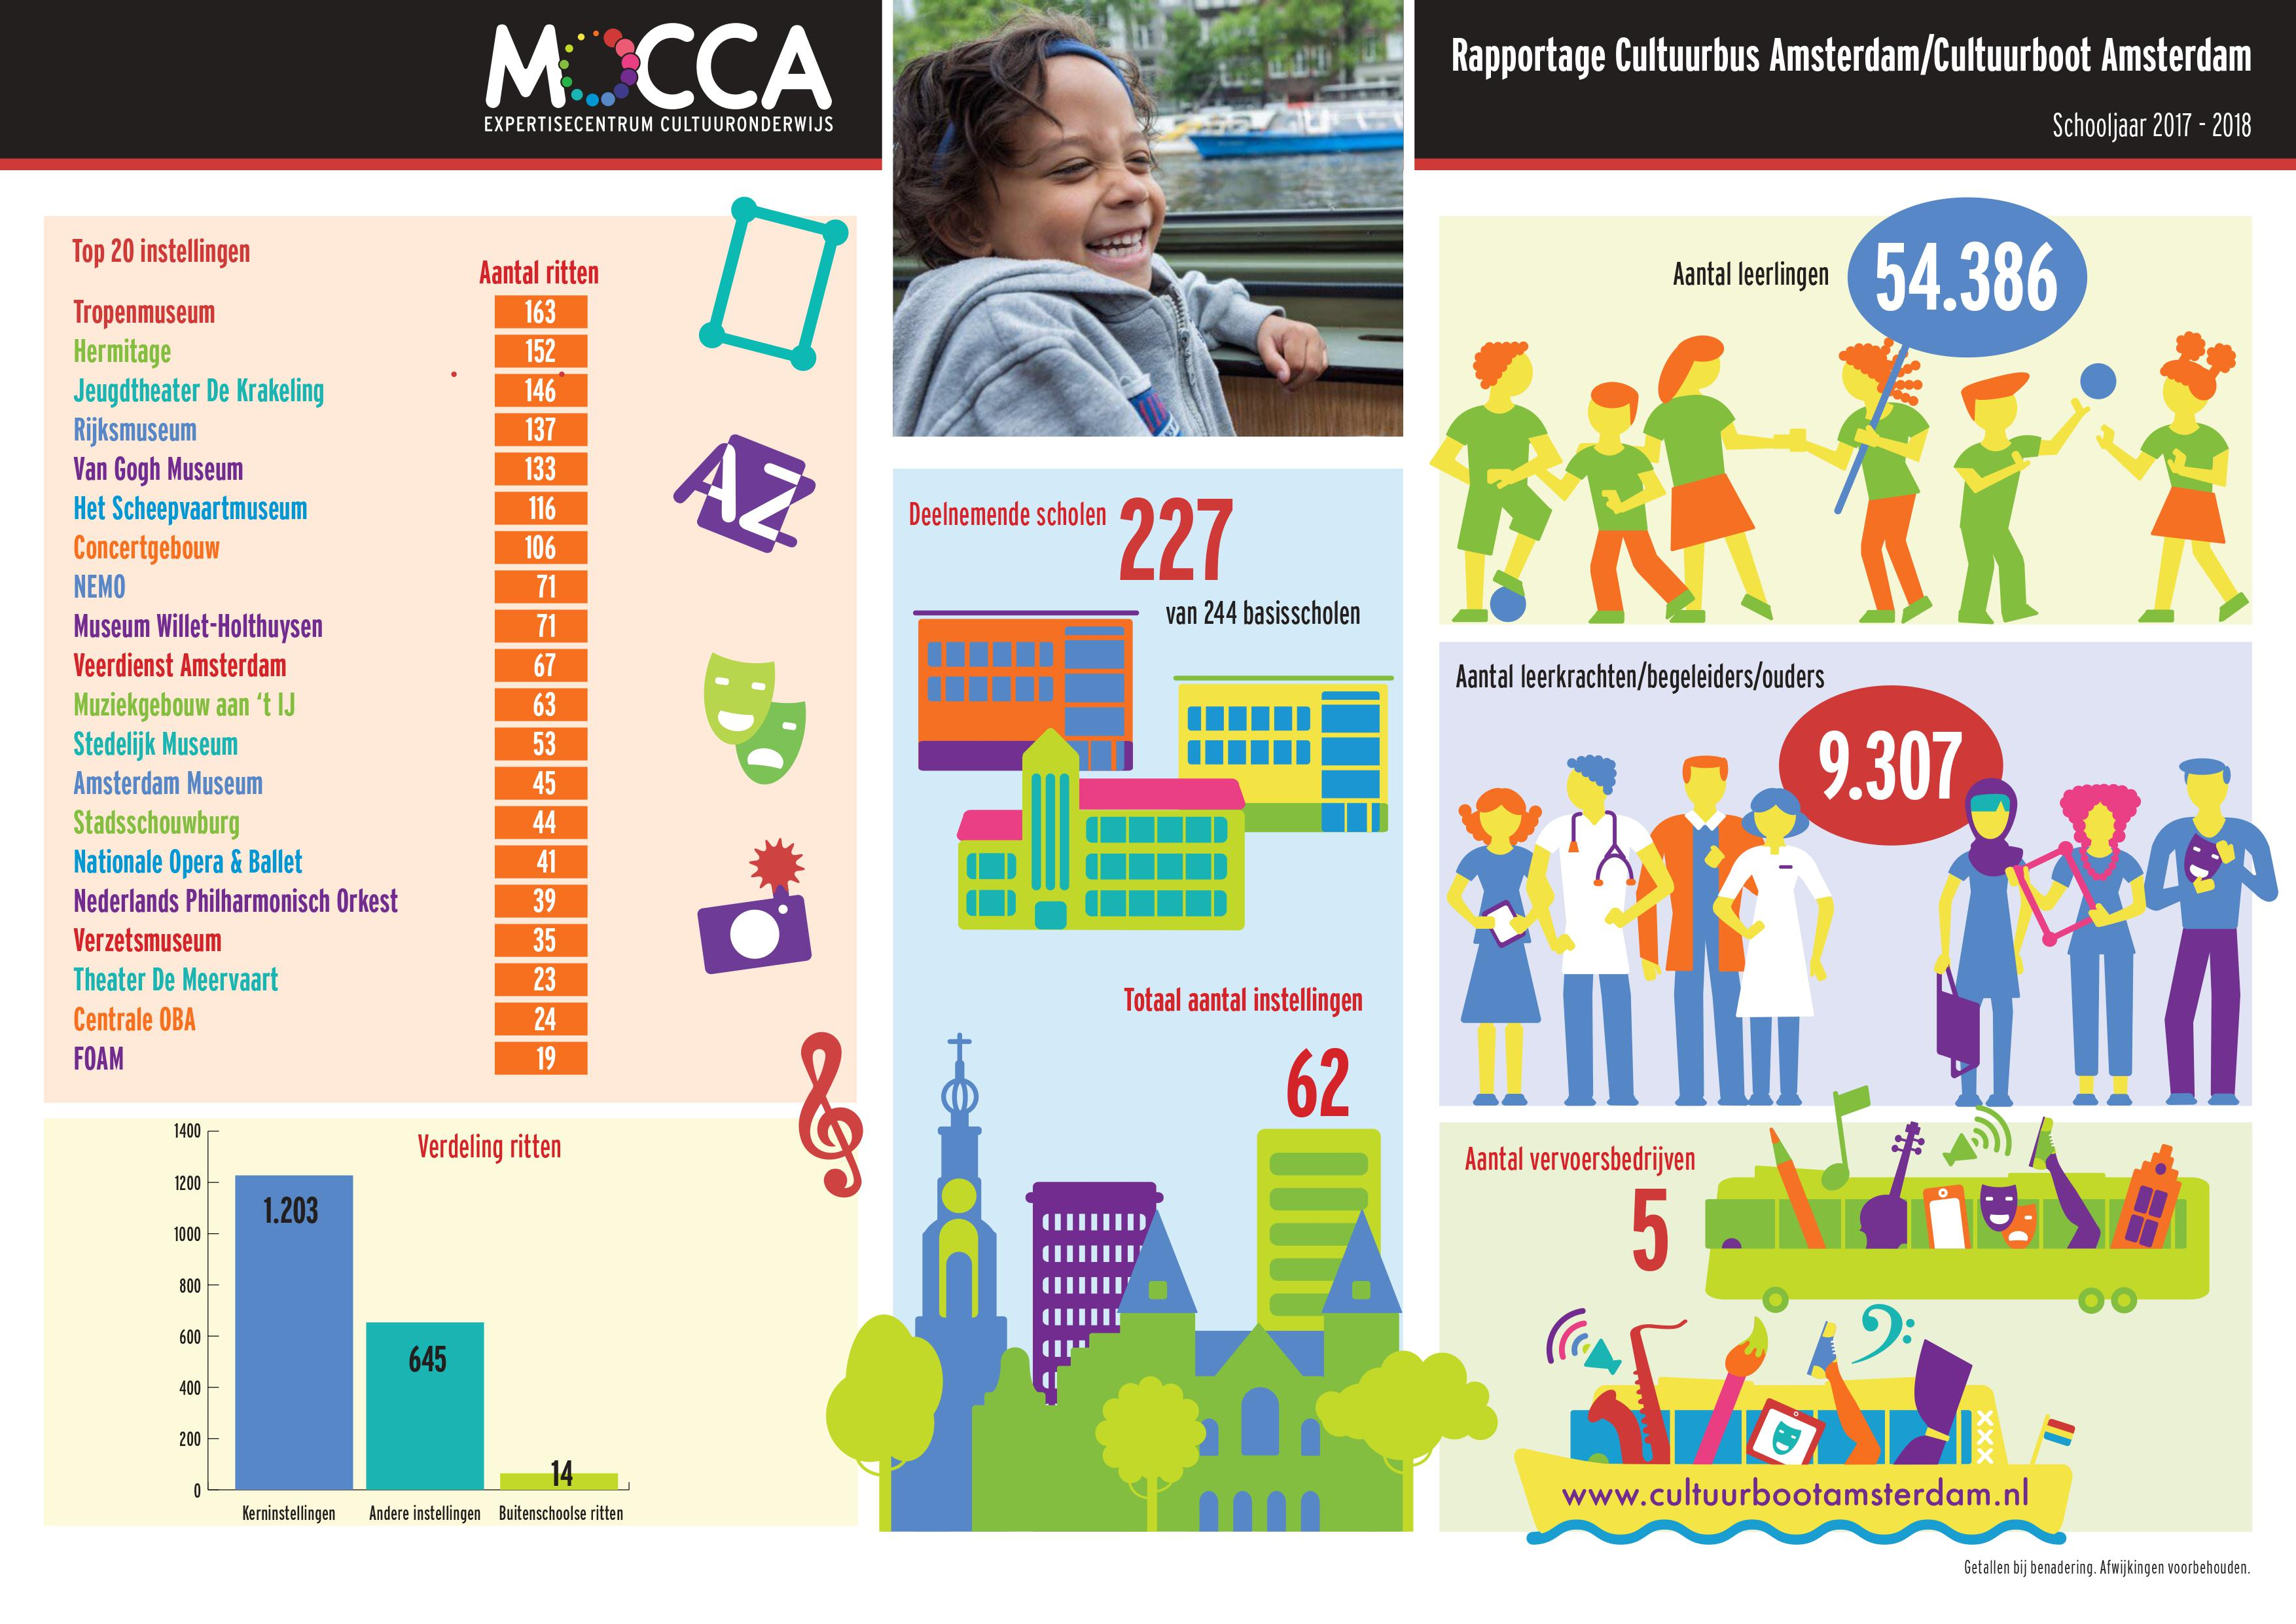 cultuurbus factsheet schooljaar 2017-2018